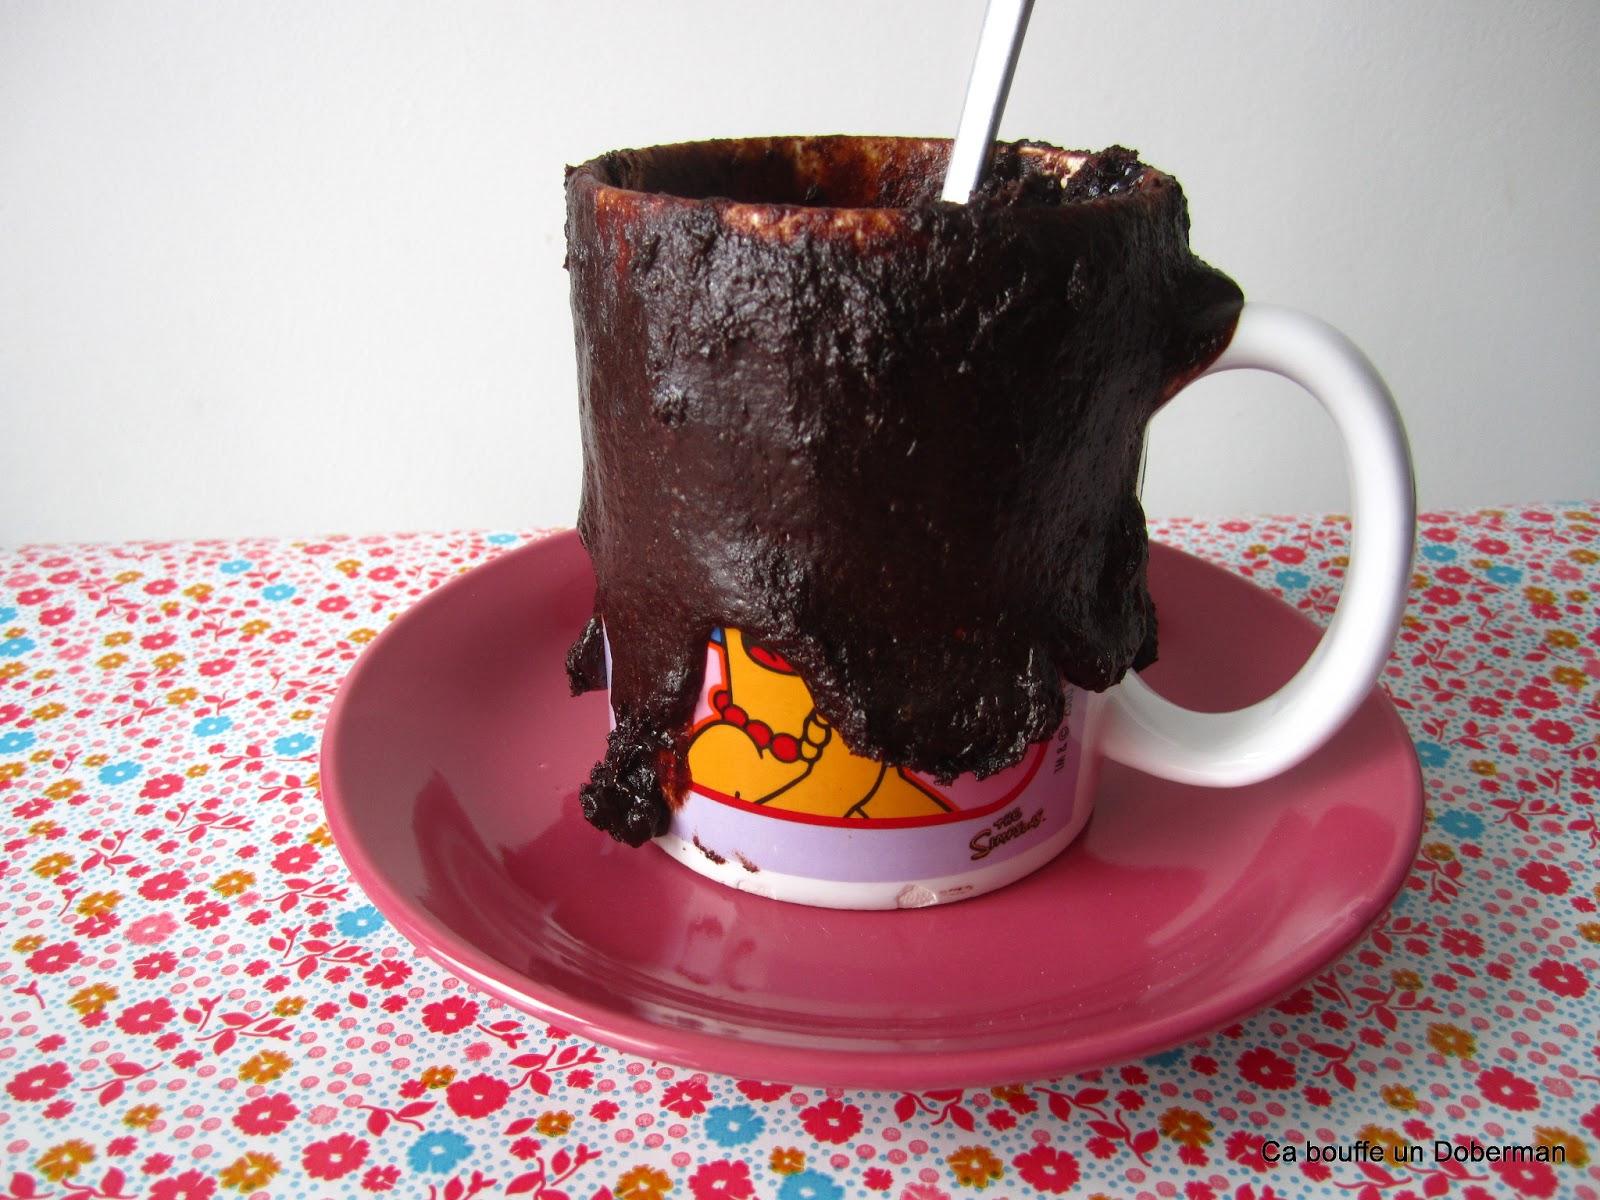 Ca bouffe un doberman le mug cake au chocolat qui fait bloup bloup - Gateau dans un mug ...